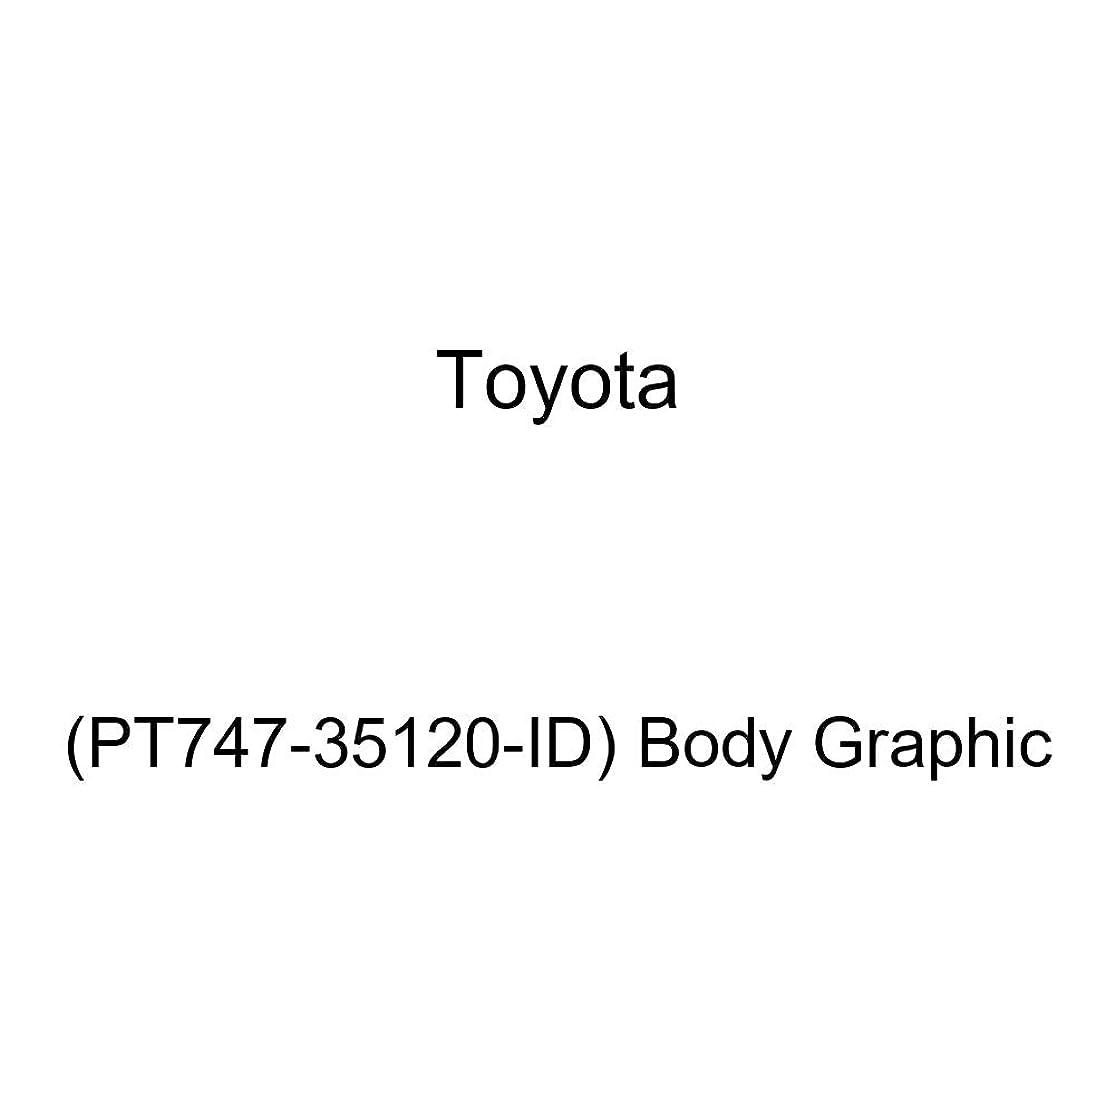 TOYOTA Genuine (PT747-35120-ID) Body Graphic iinjcsuv3